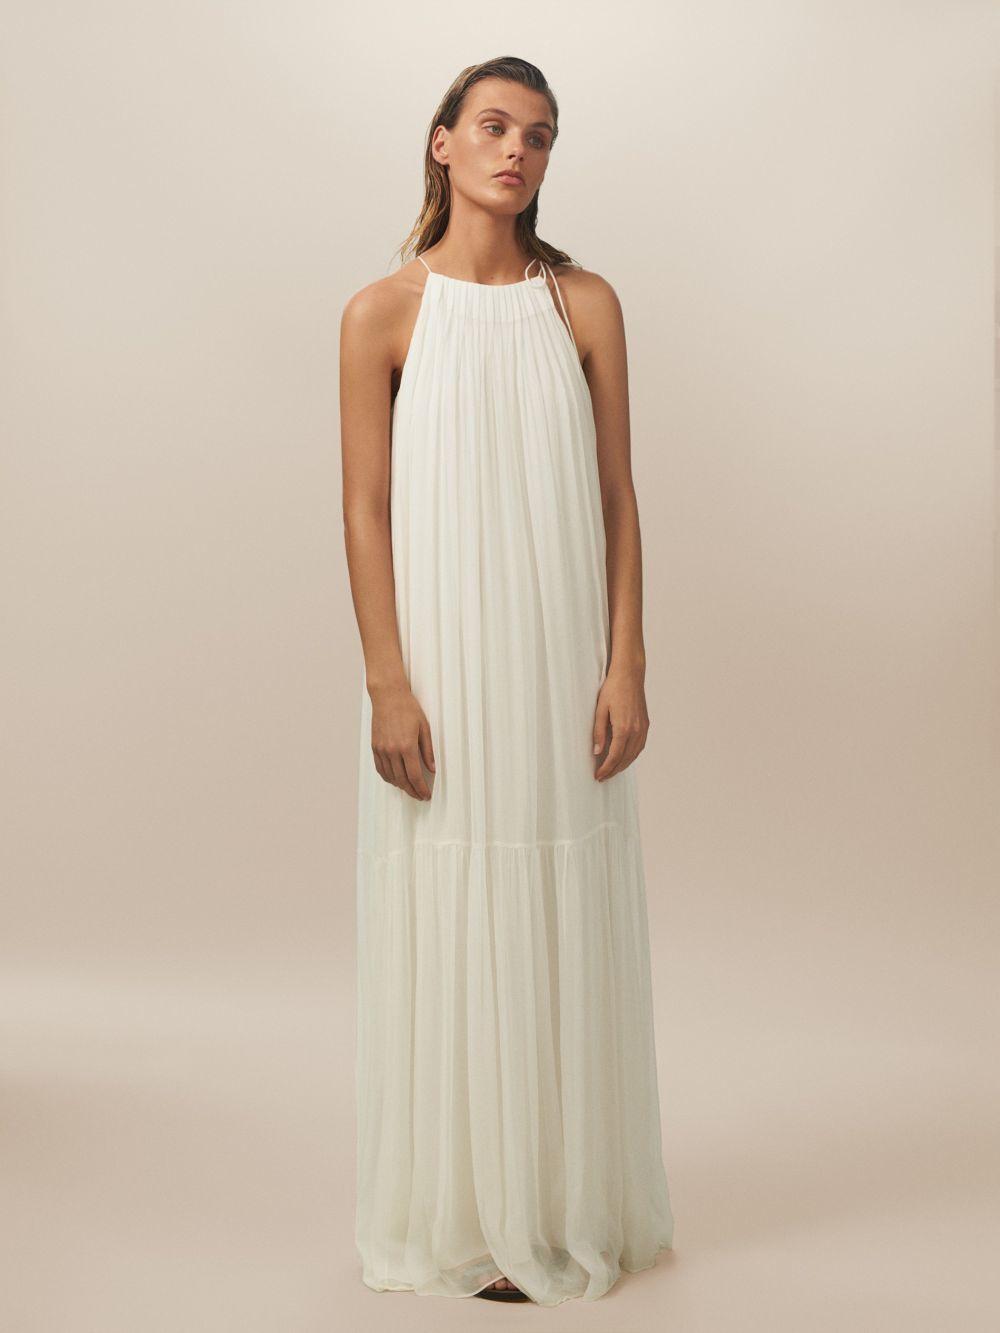 Vestido bámbula, de Massimo Dutti (169 euros).